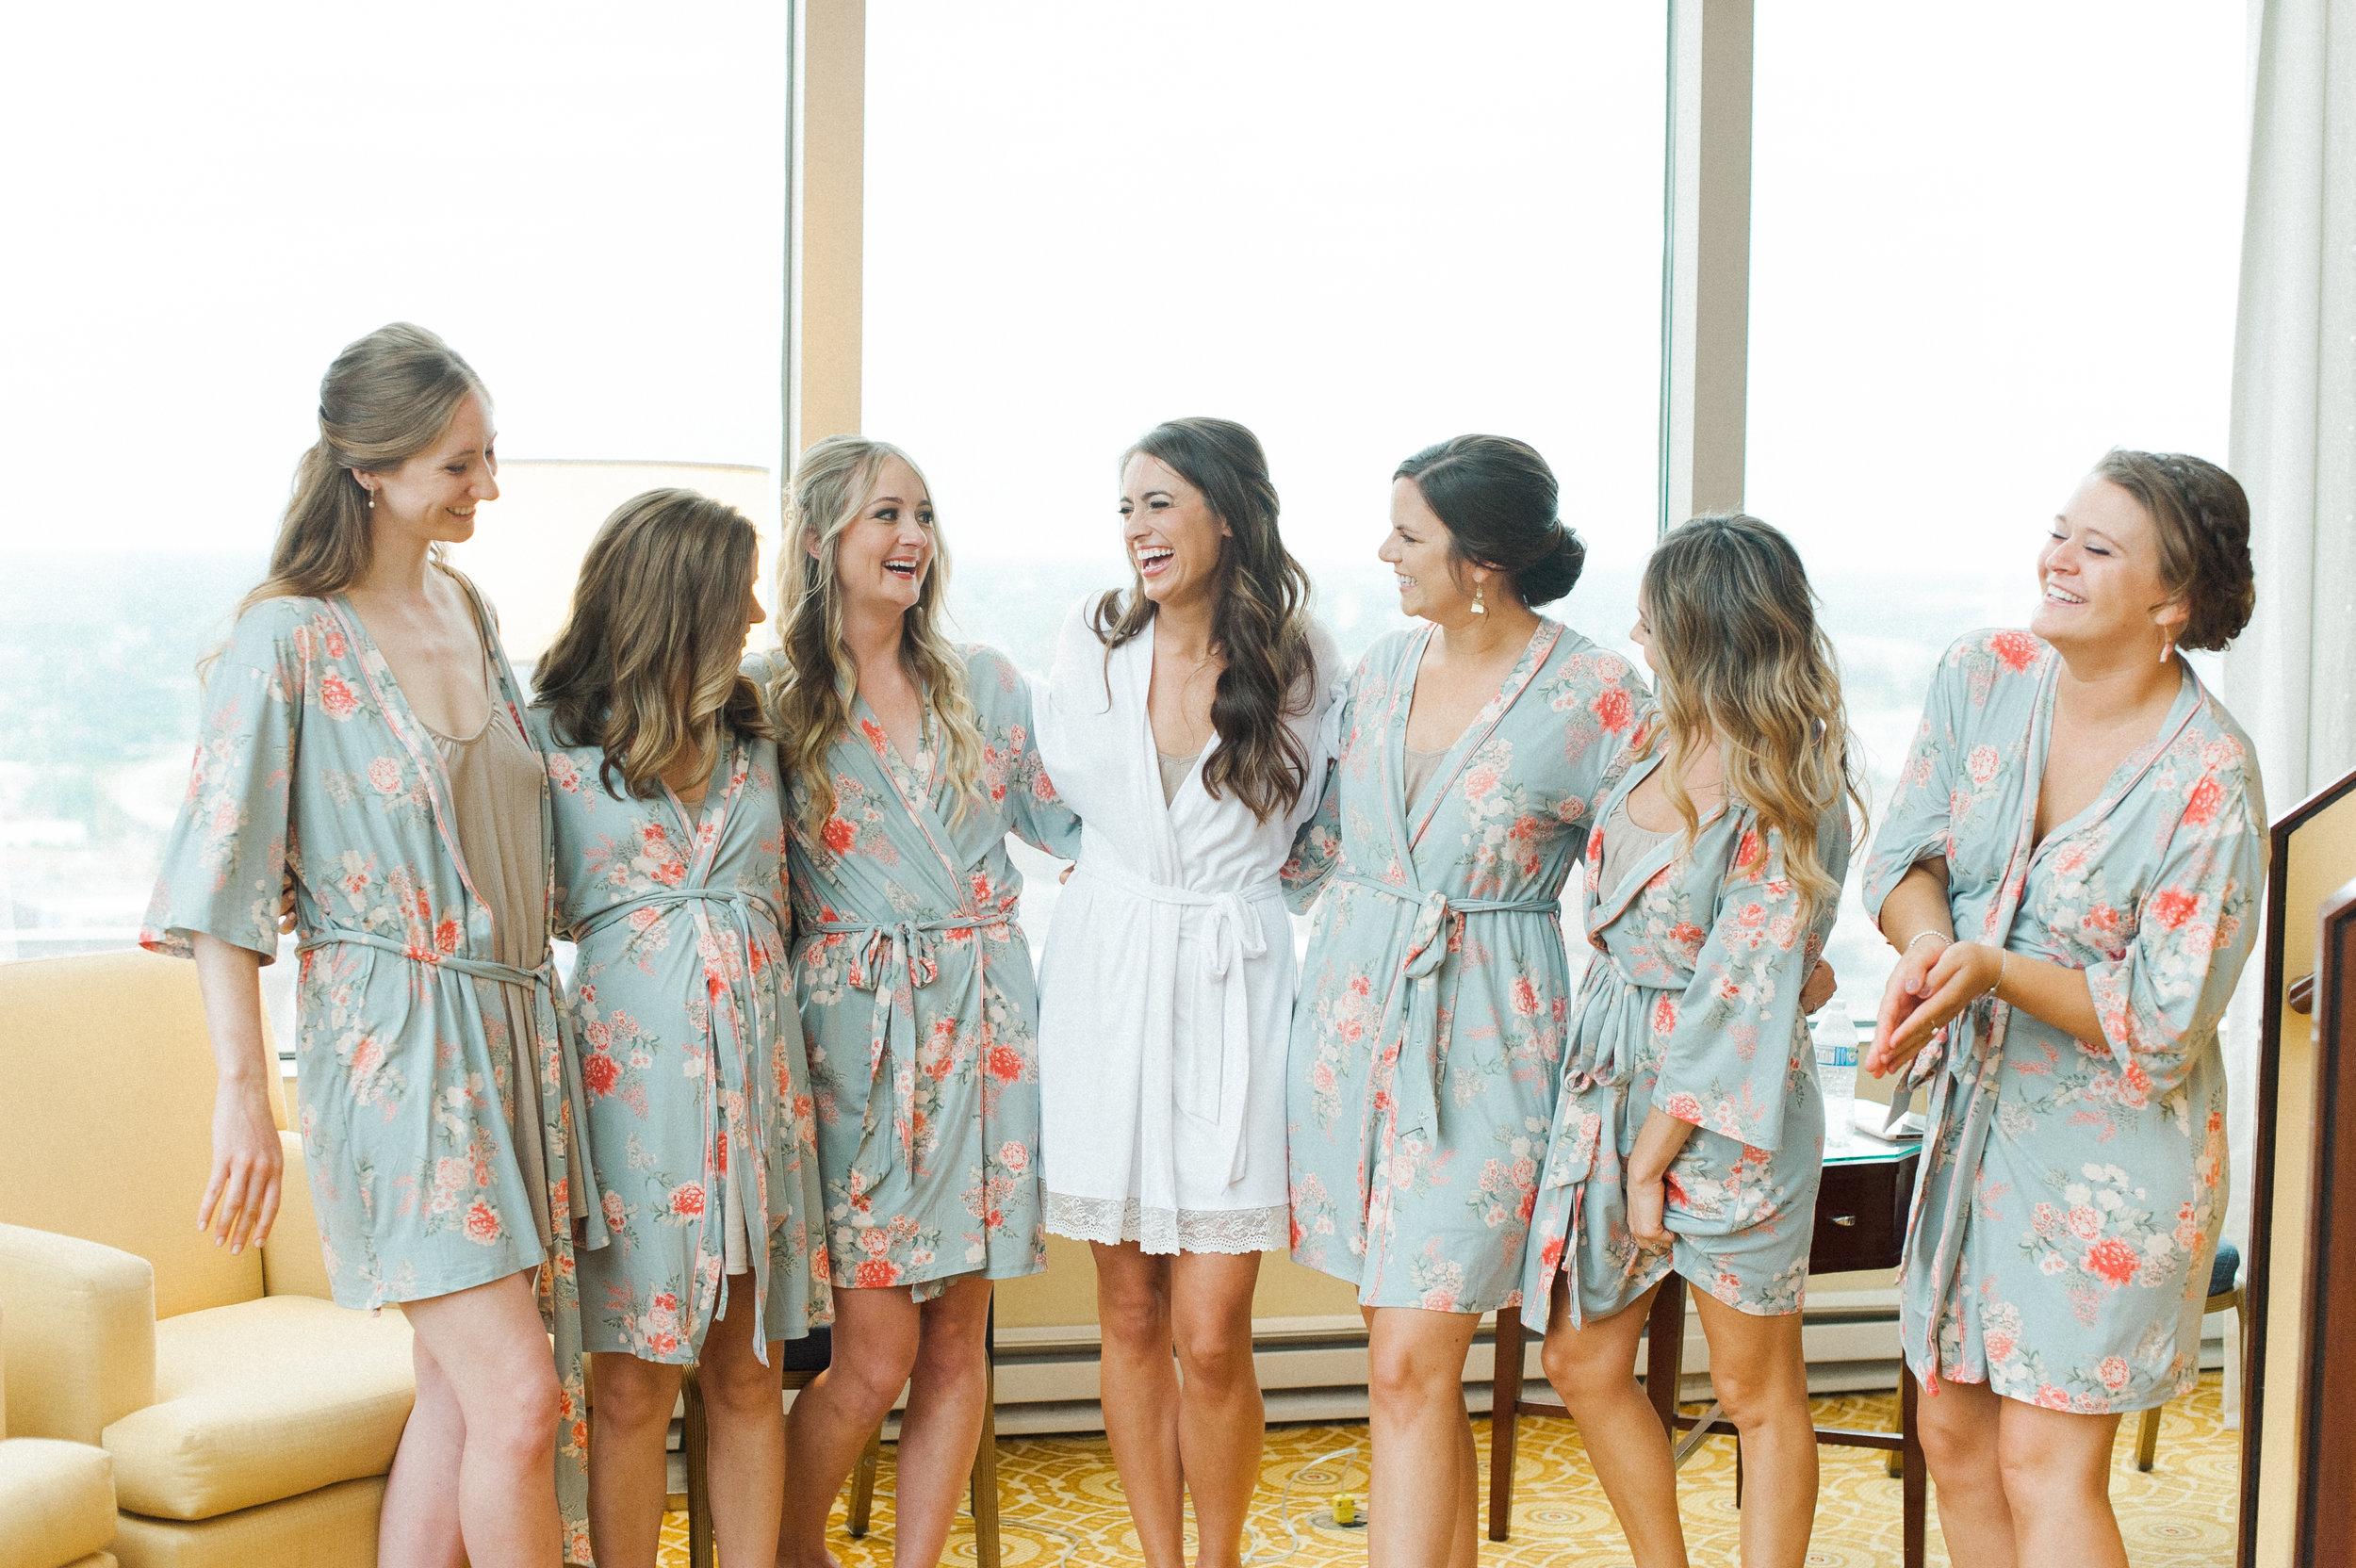 Bridesmaids-Getting-Ready.jpg